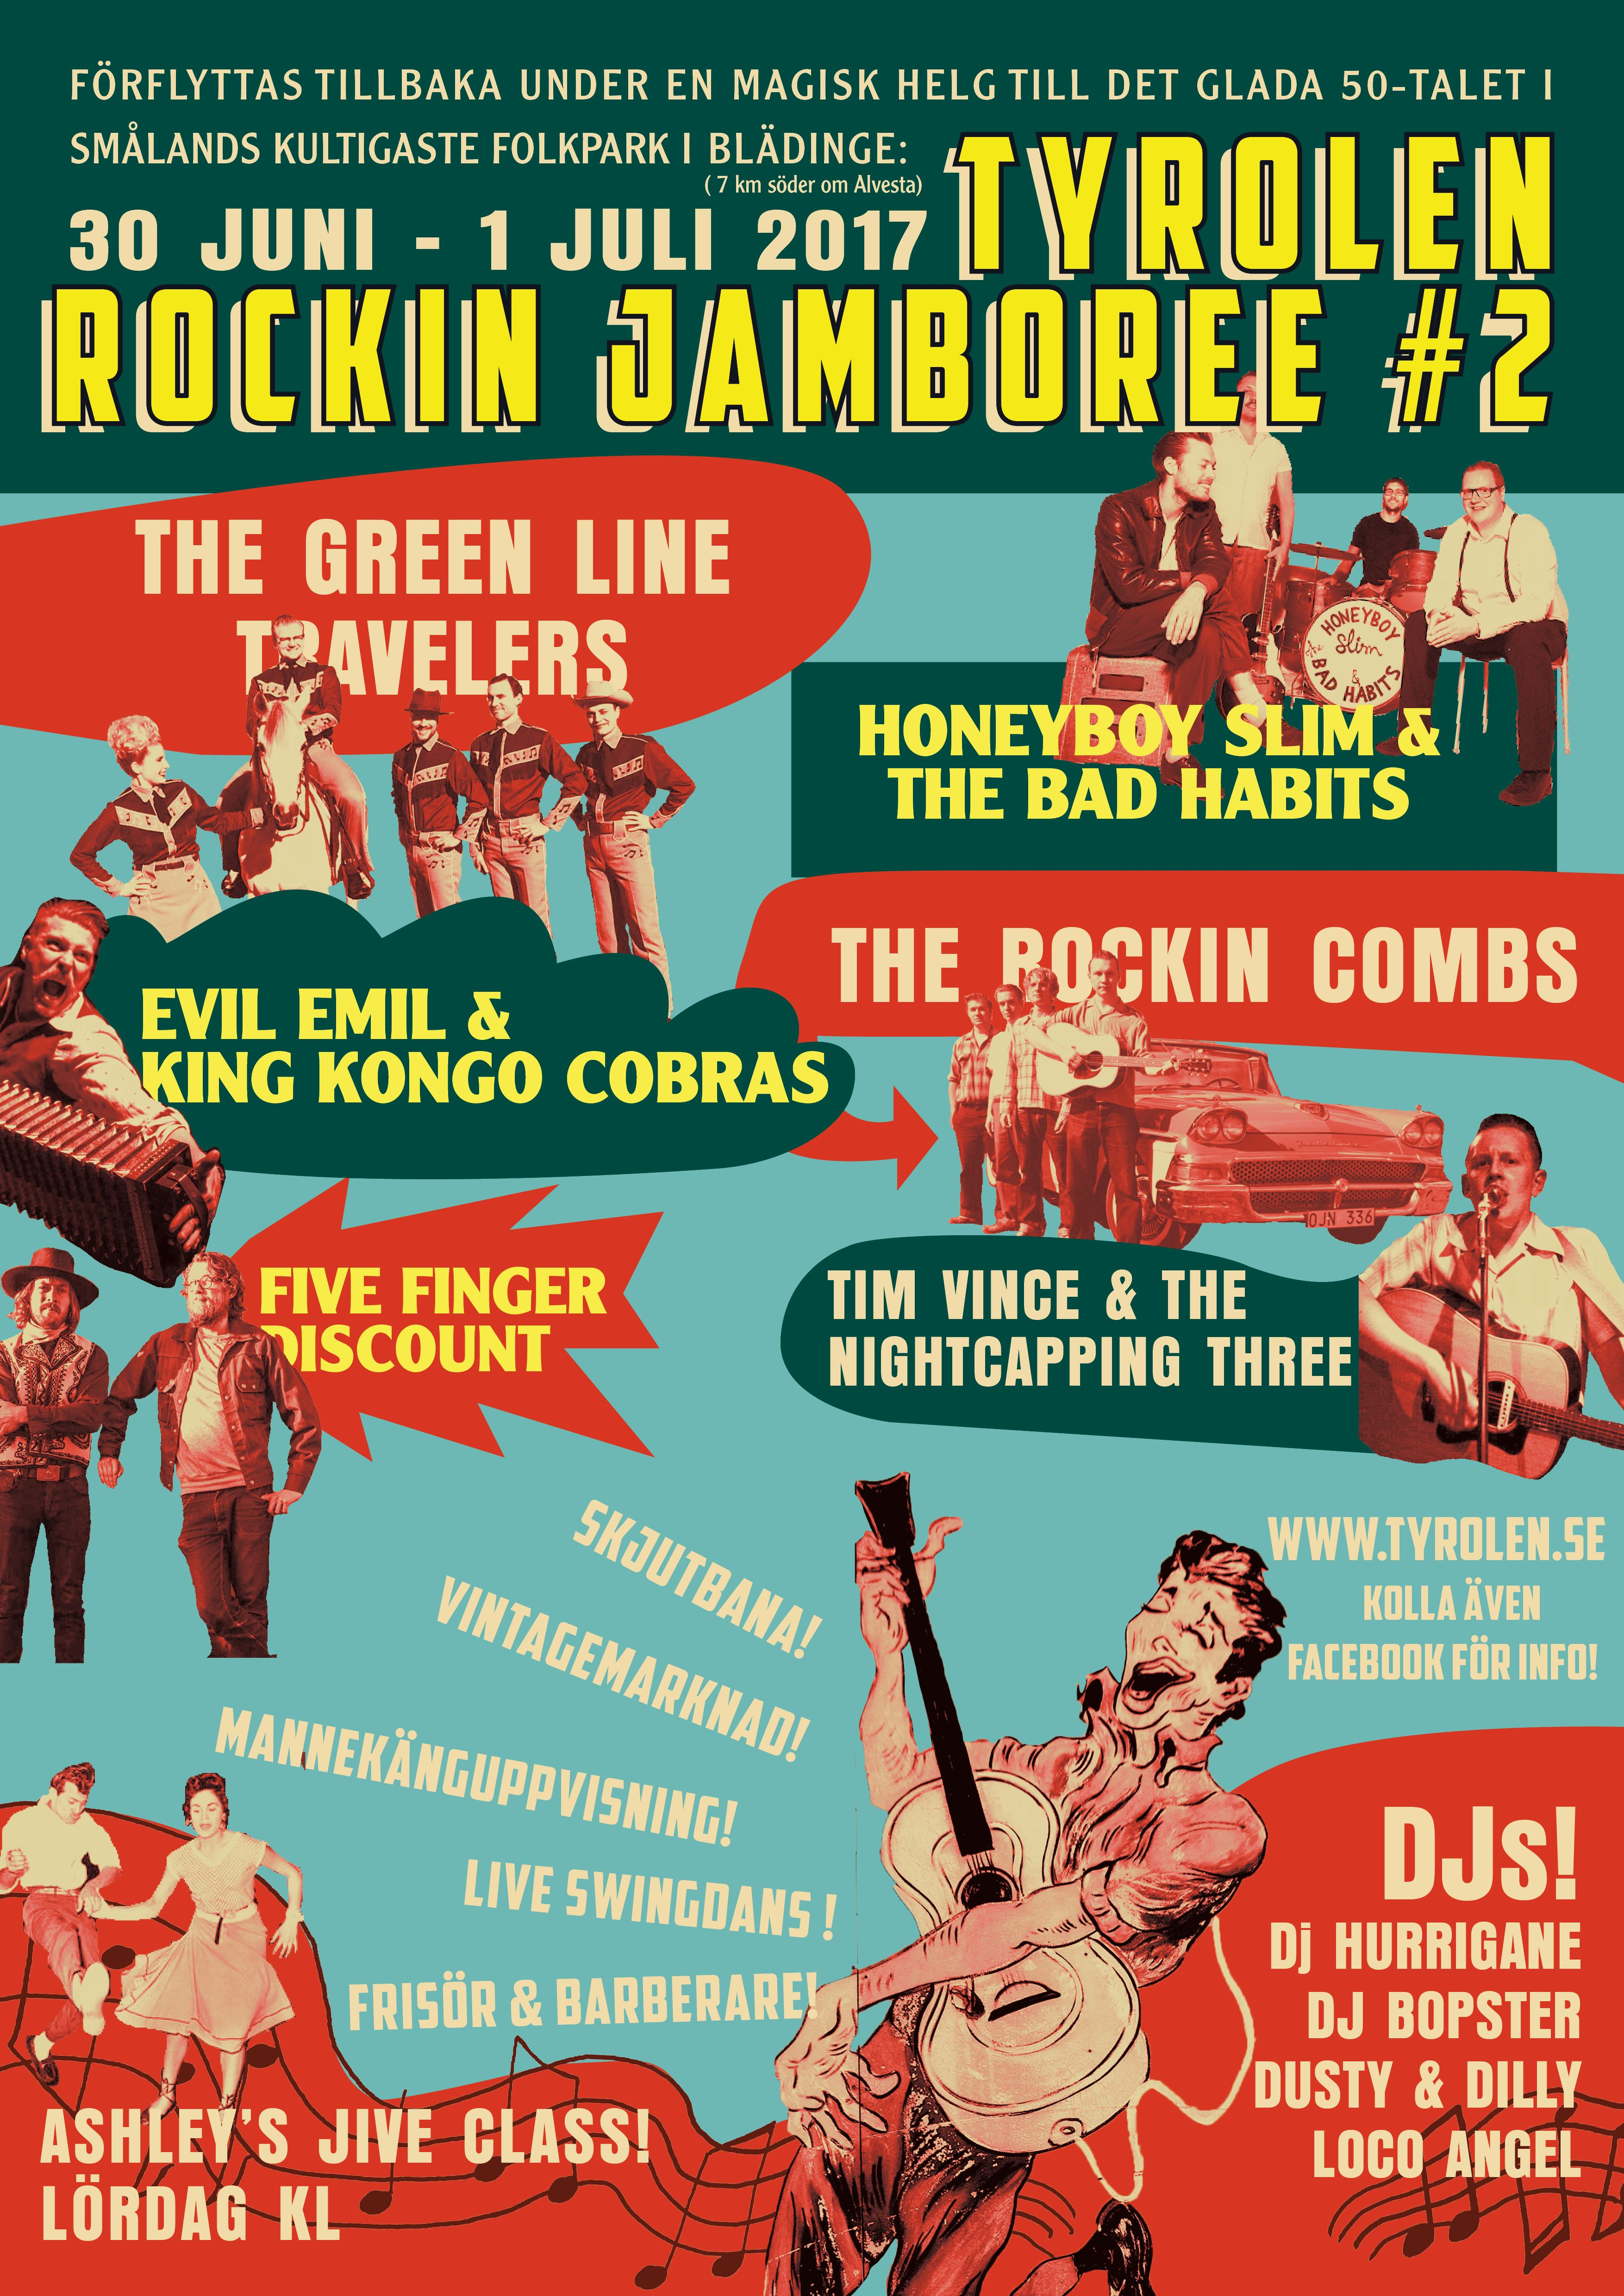 Tyrolen Rockin Jamboree #2